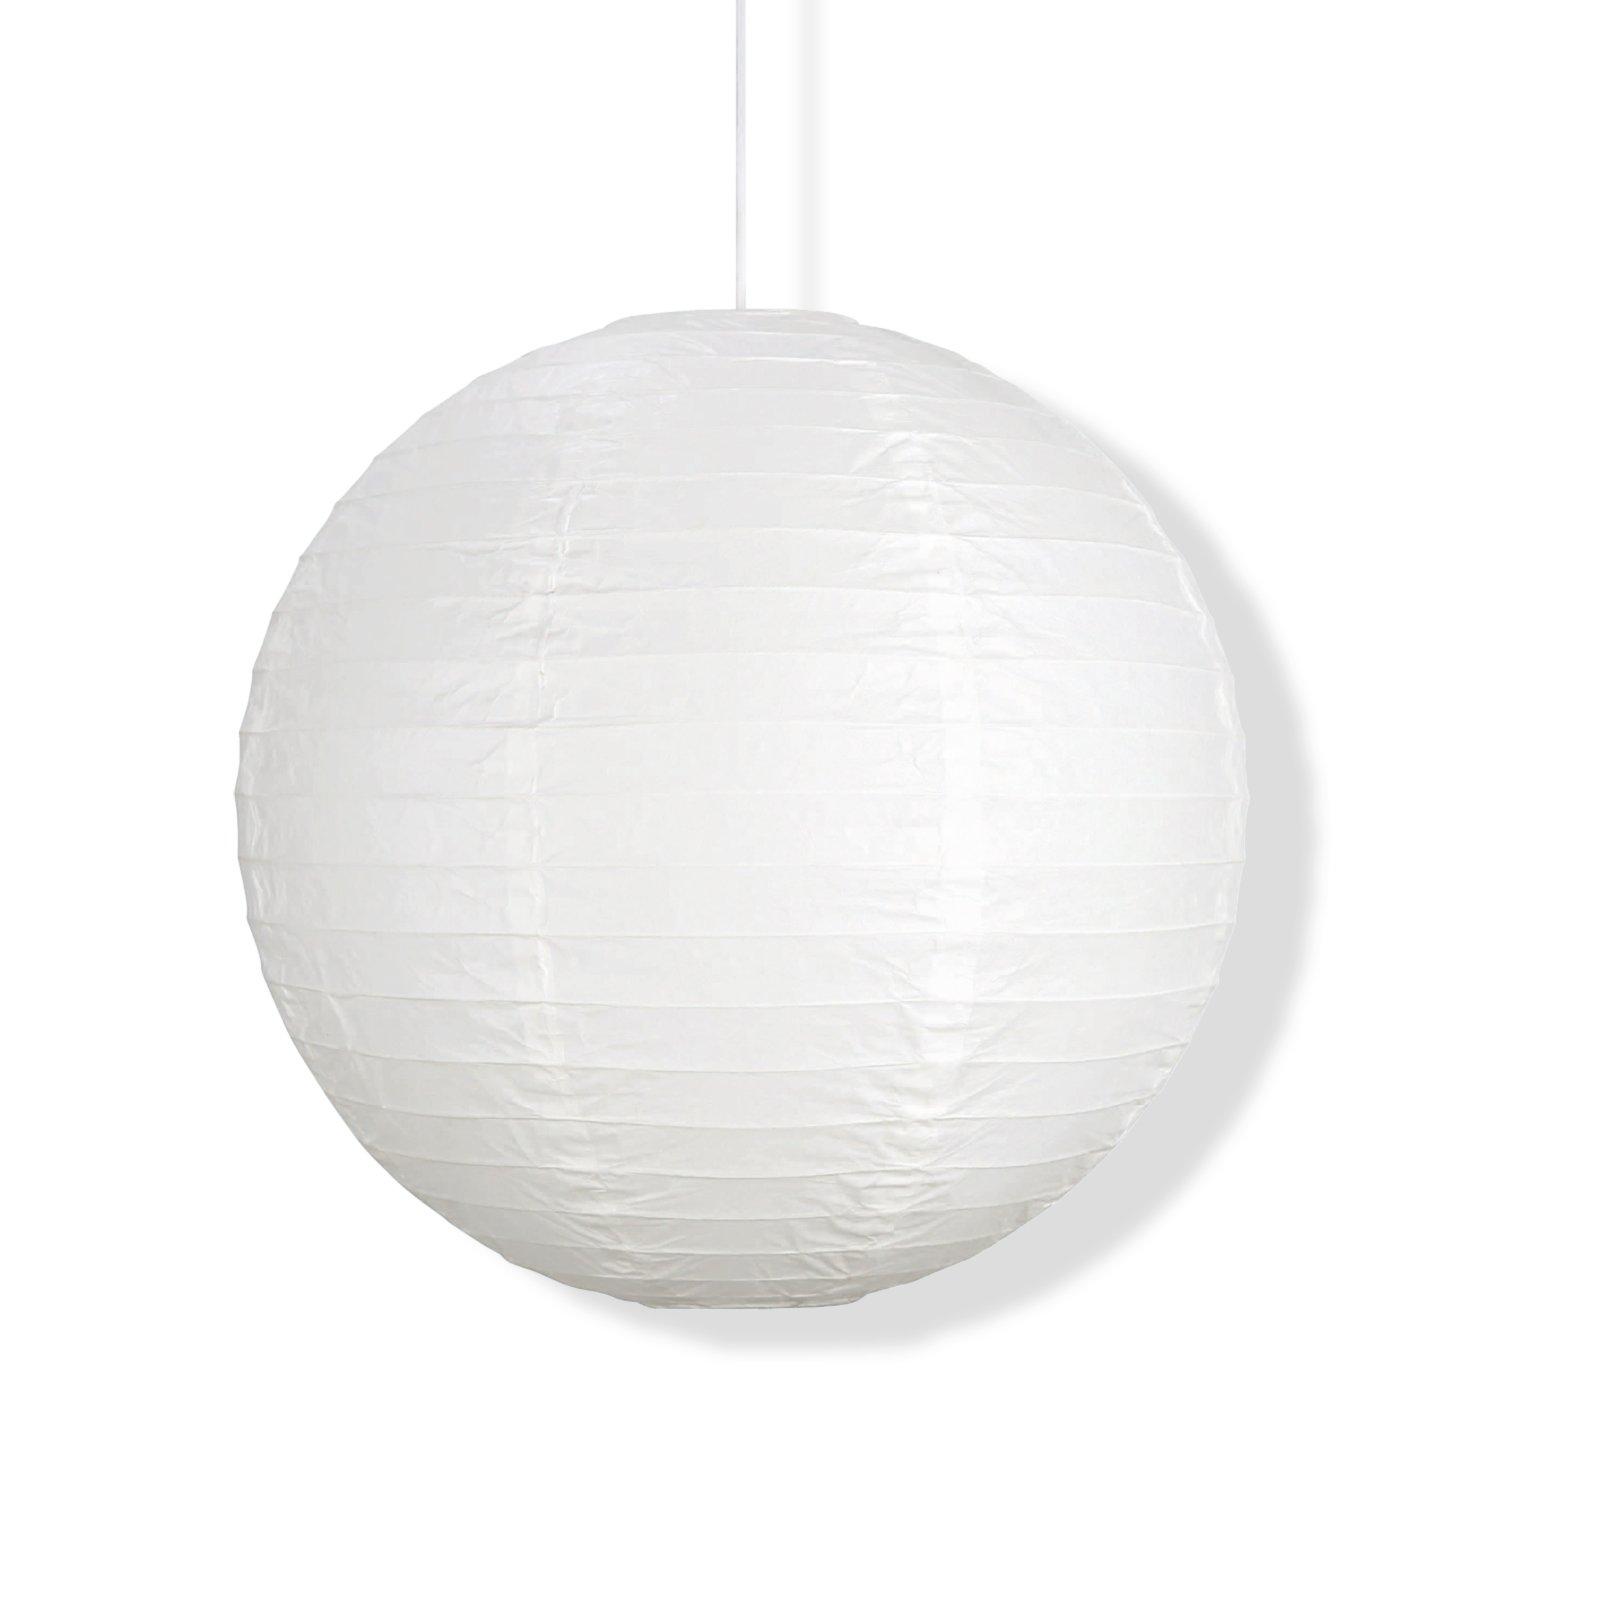 Japanballon - weiß - 50 cm